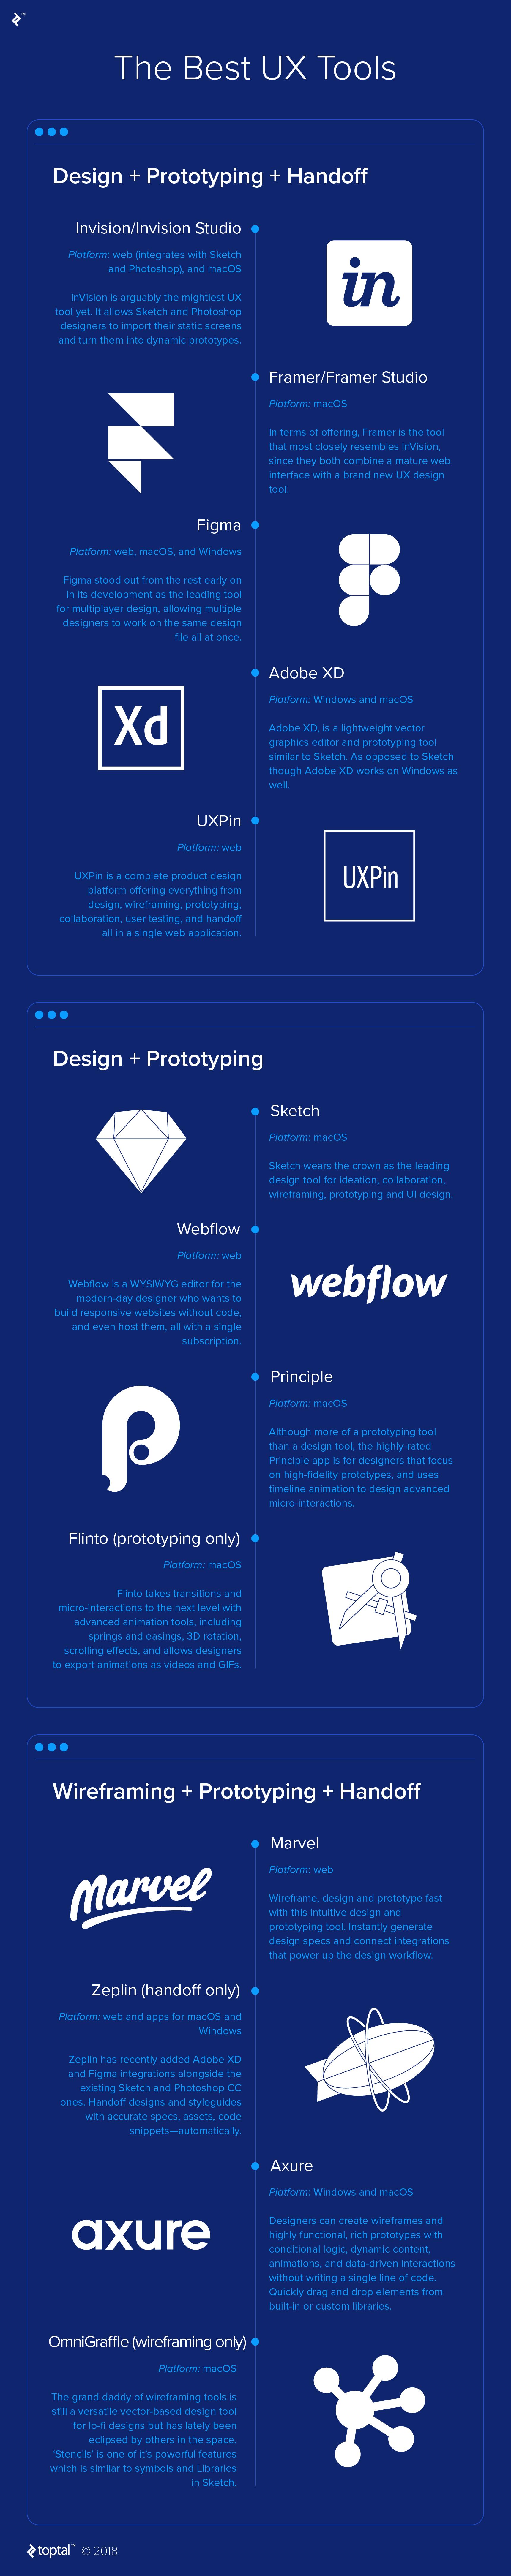 Best UX tools infographic